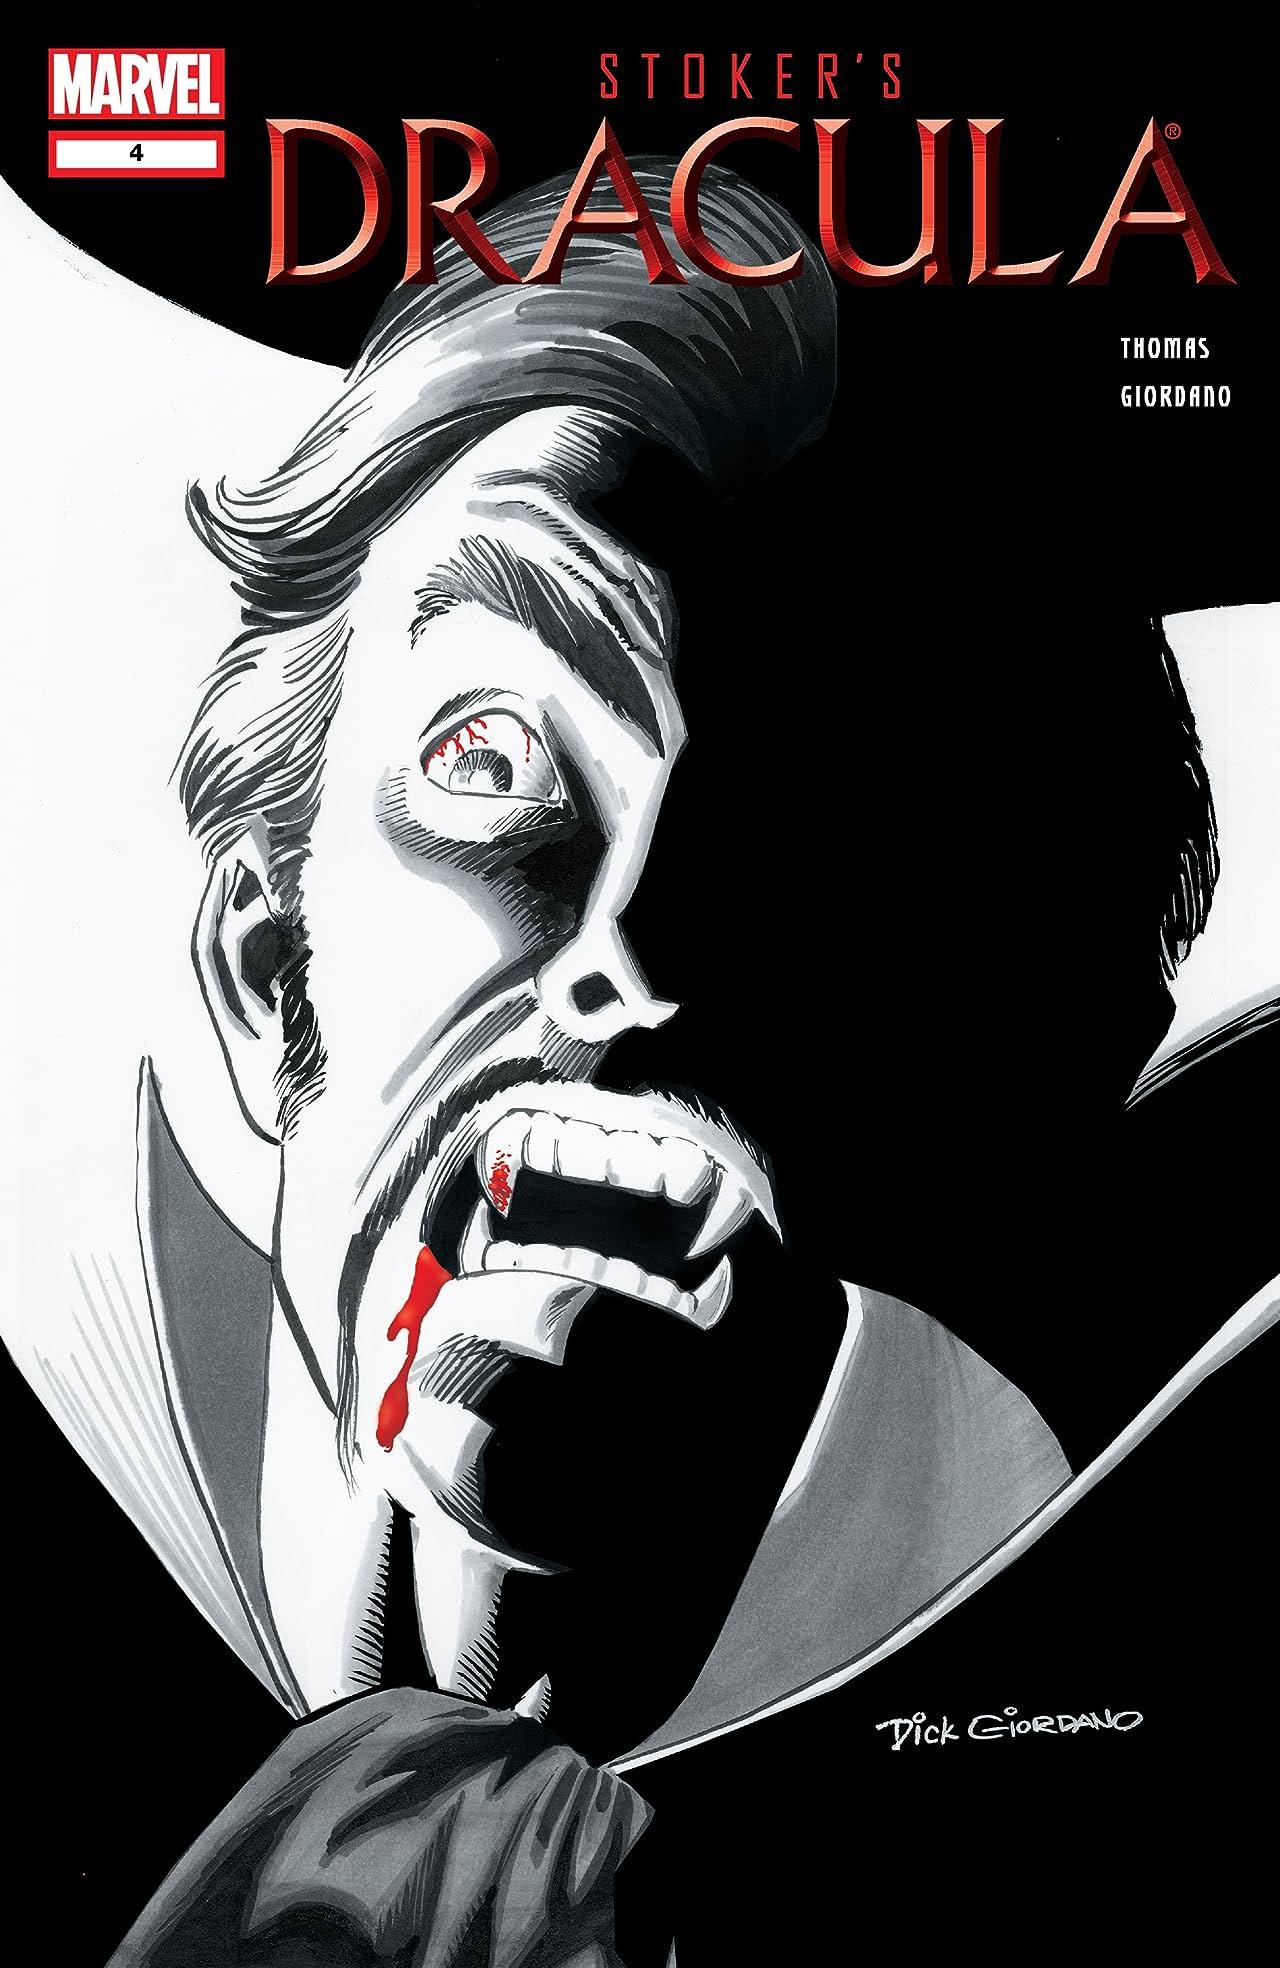 Stoker's Dracula (2004-2005) #4 (of 4)